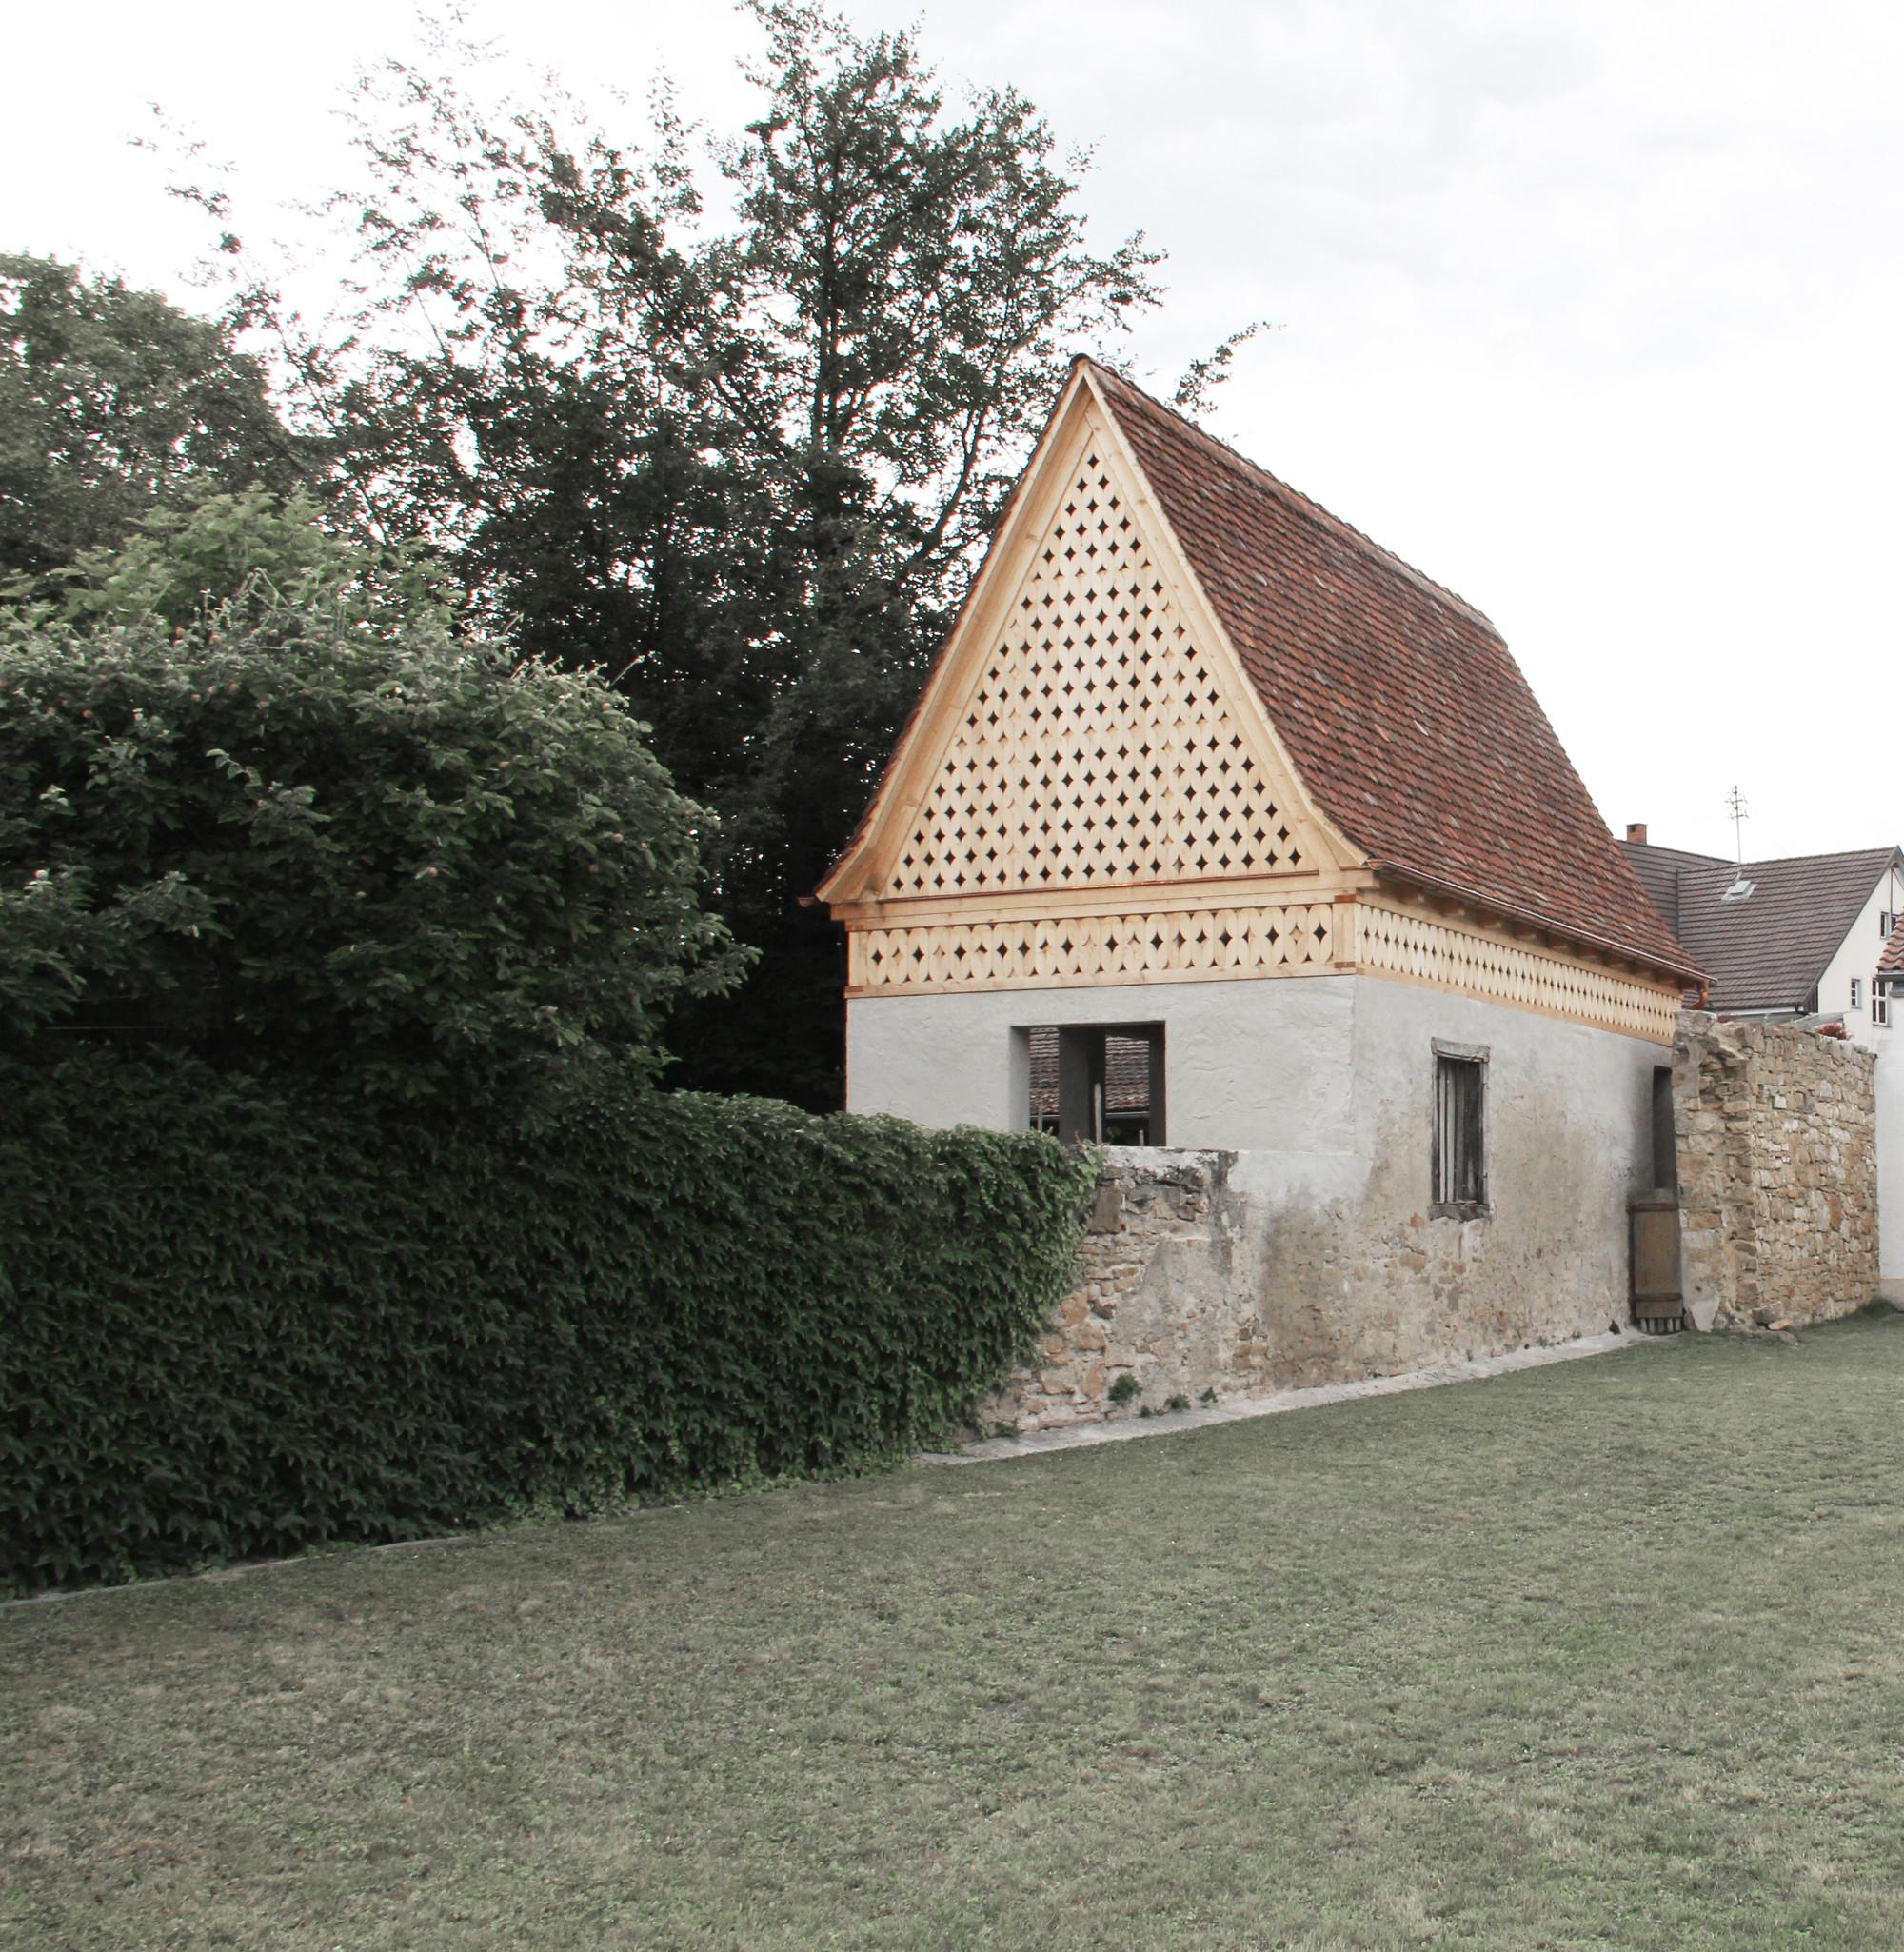 Casa en el Jardín / Vécsey Schmidt Architekten, © Doris Lasch